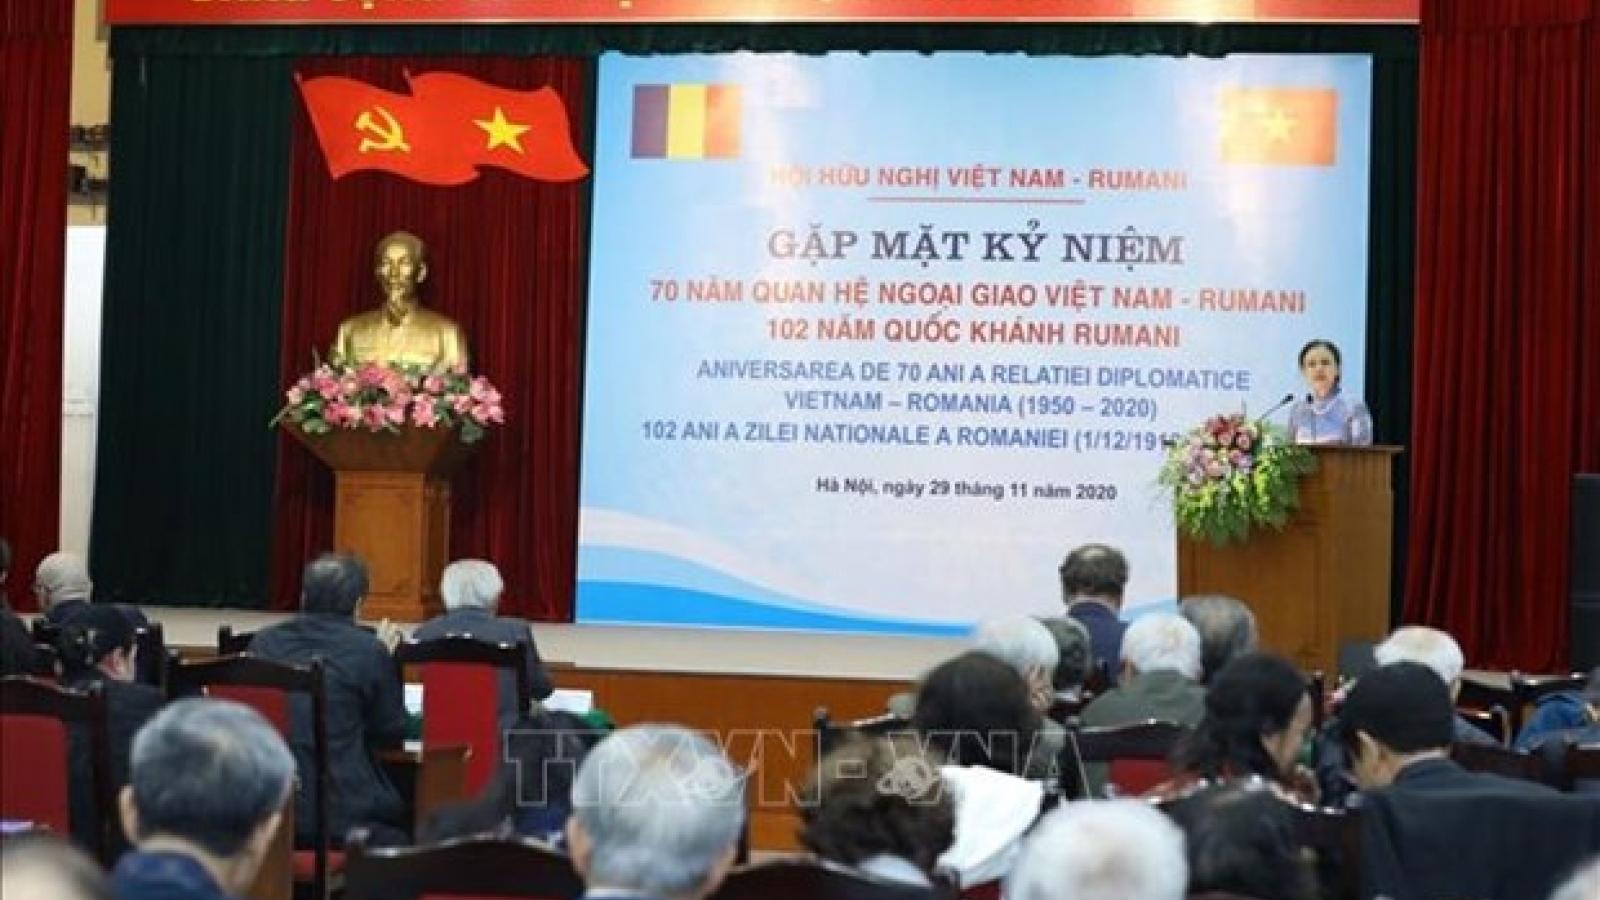 Hanoi celebrates 70th anniversary of Vietnam-Romania diplomatic relations